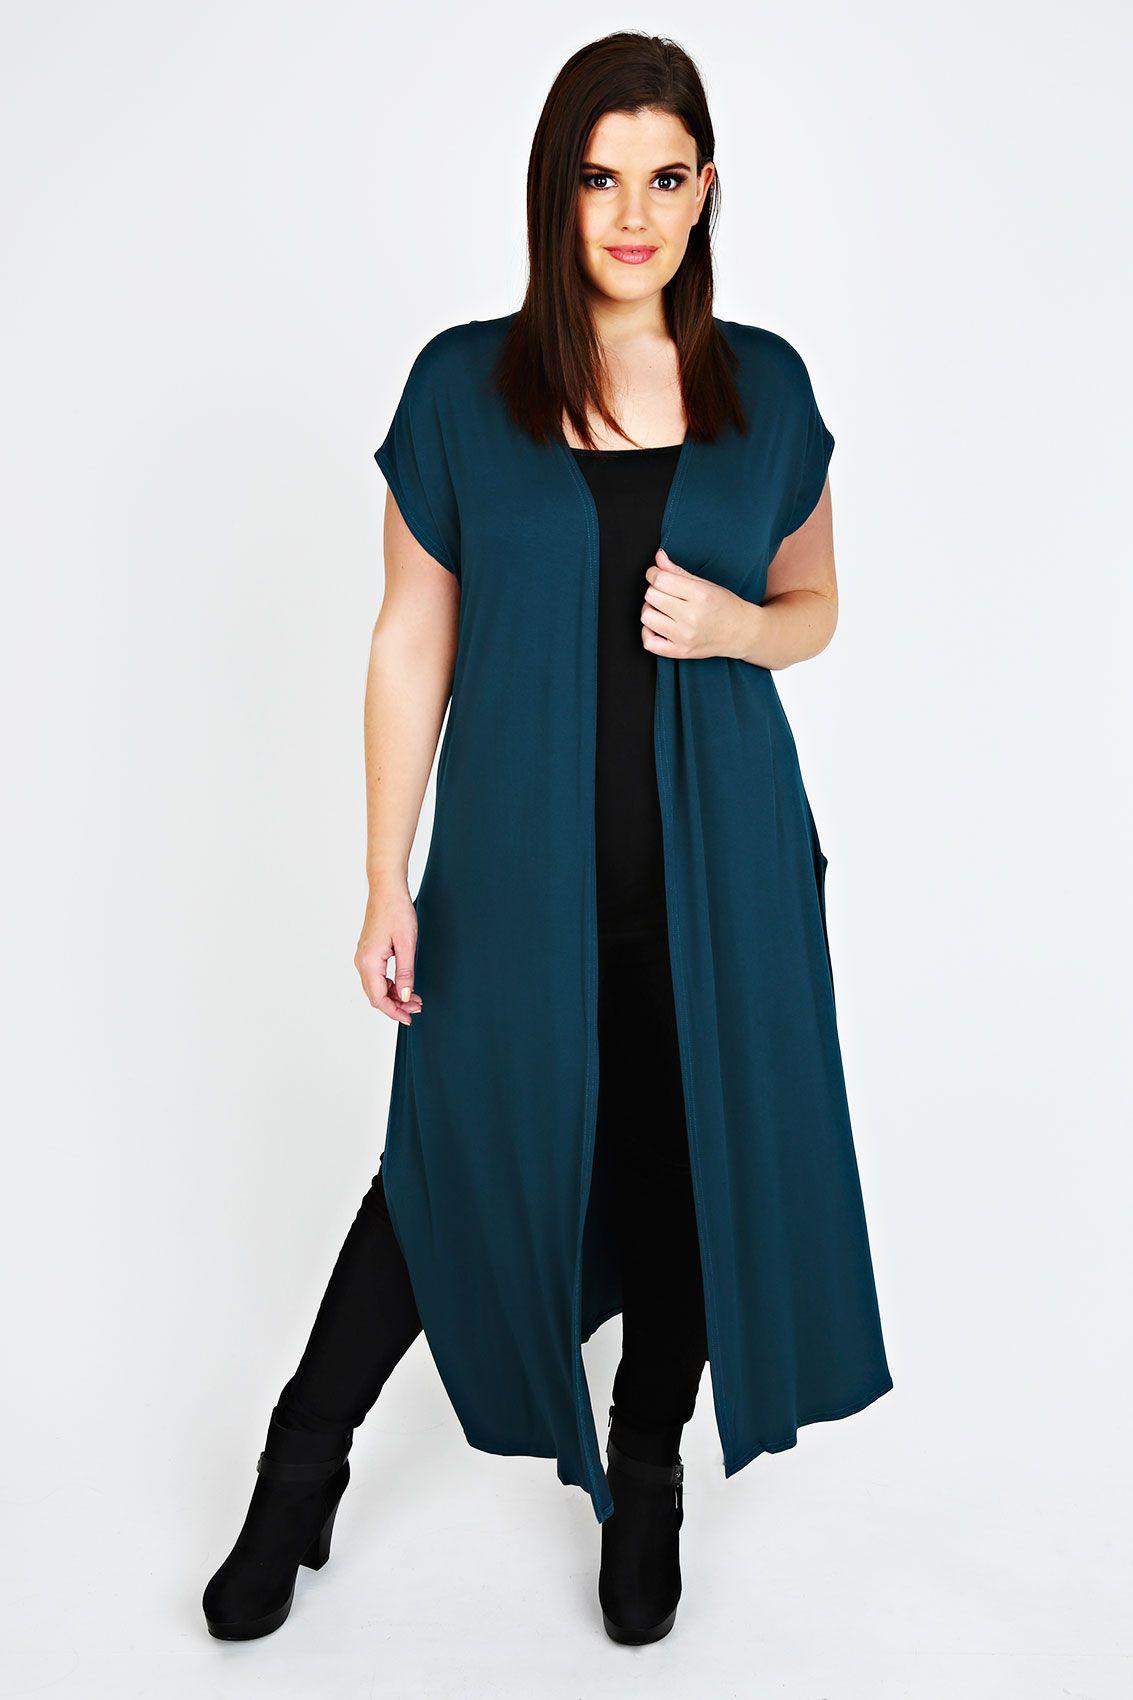 Teal Longline Maxi Cardigan   Maxi cardigan, Teal and Stretch fabric